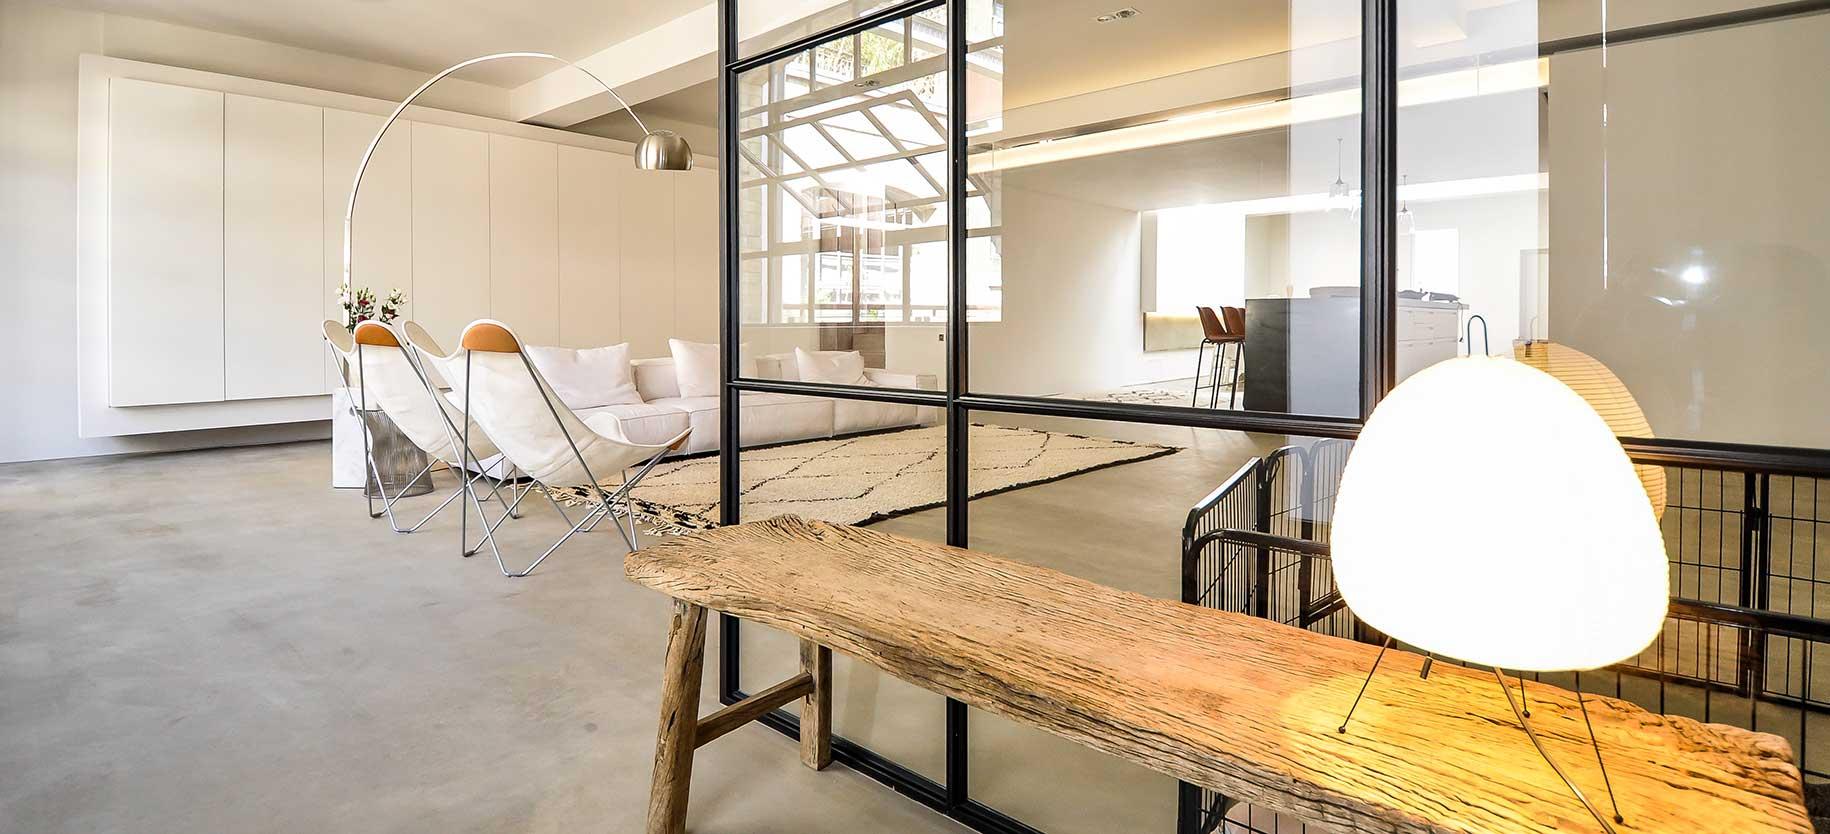 Nile St, N1, Creative Rooms Development Renovations Refurbishments Slider 2